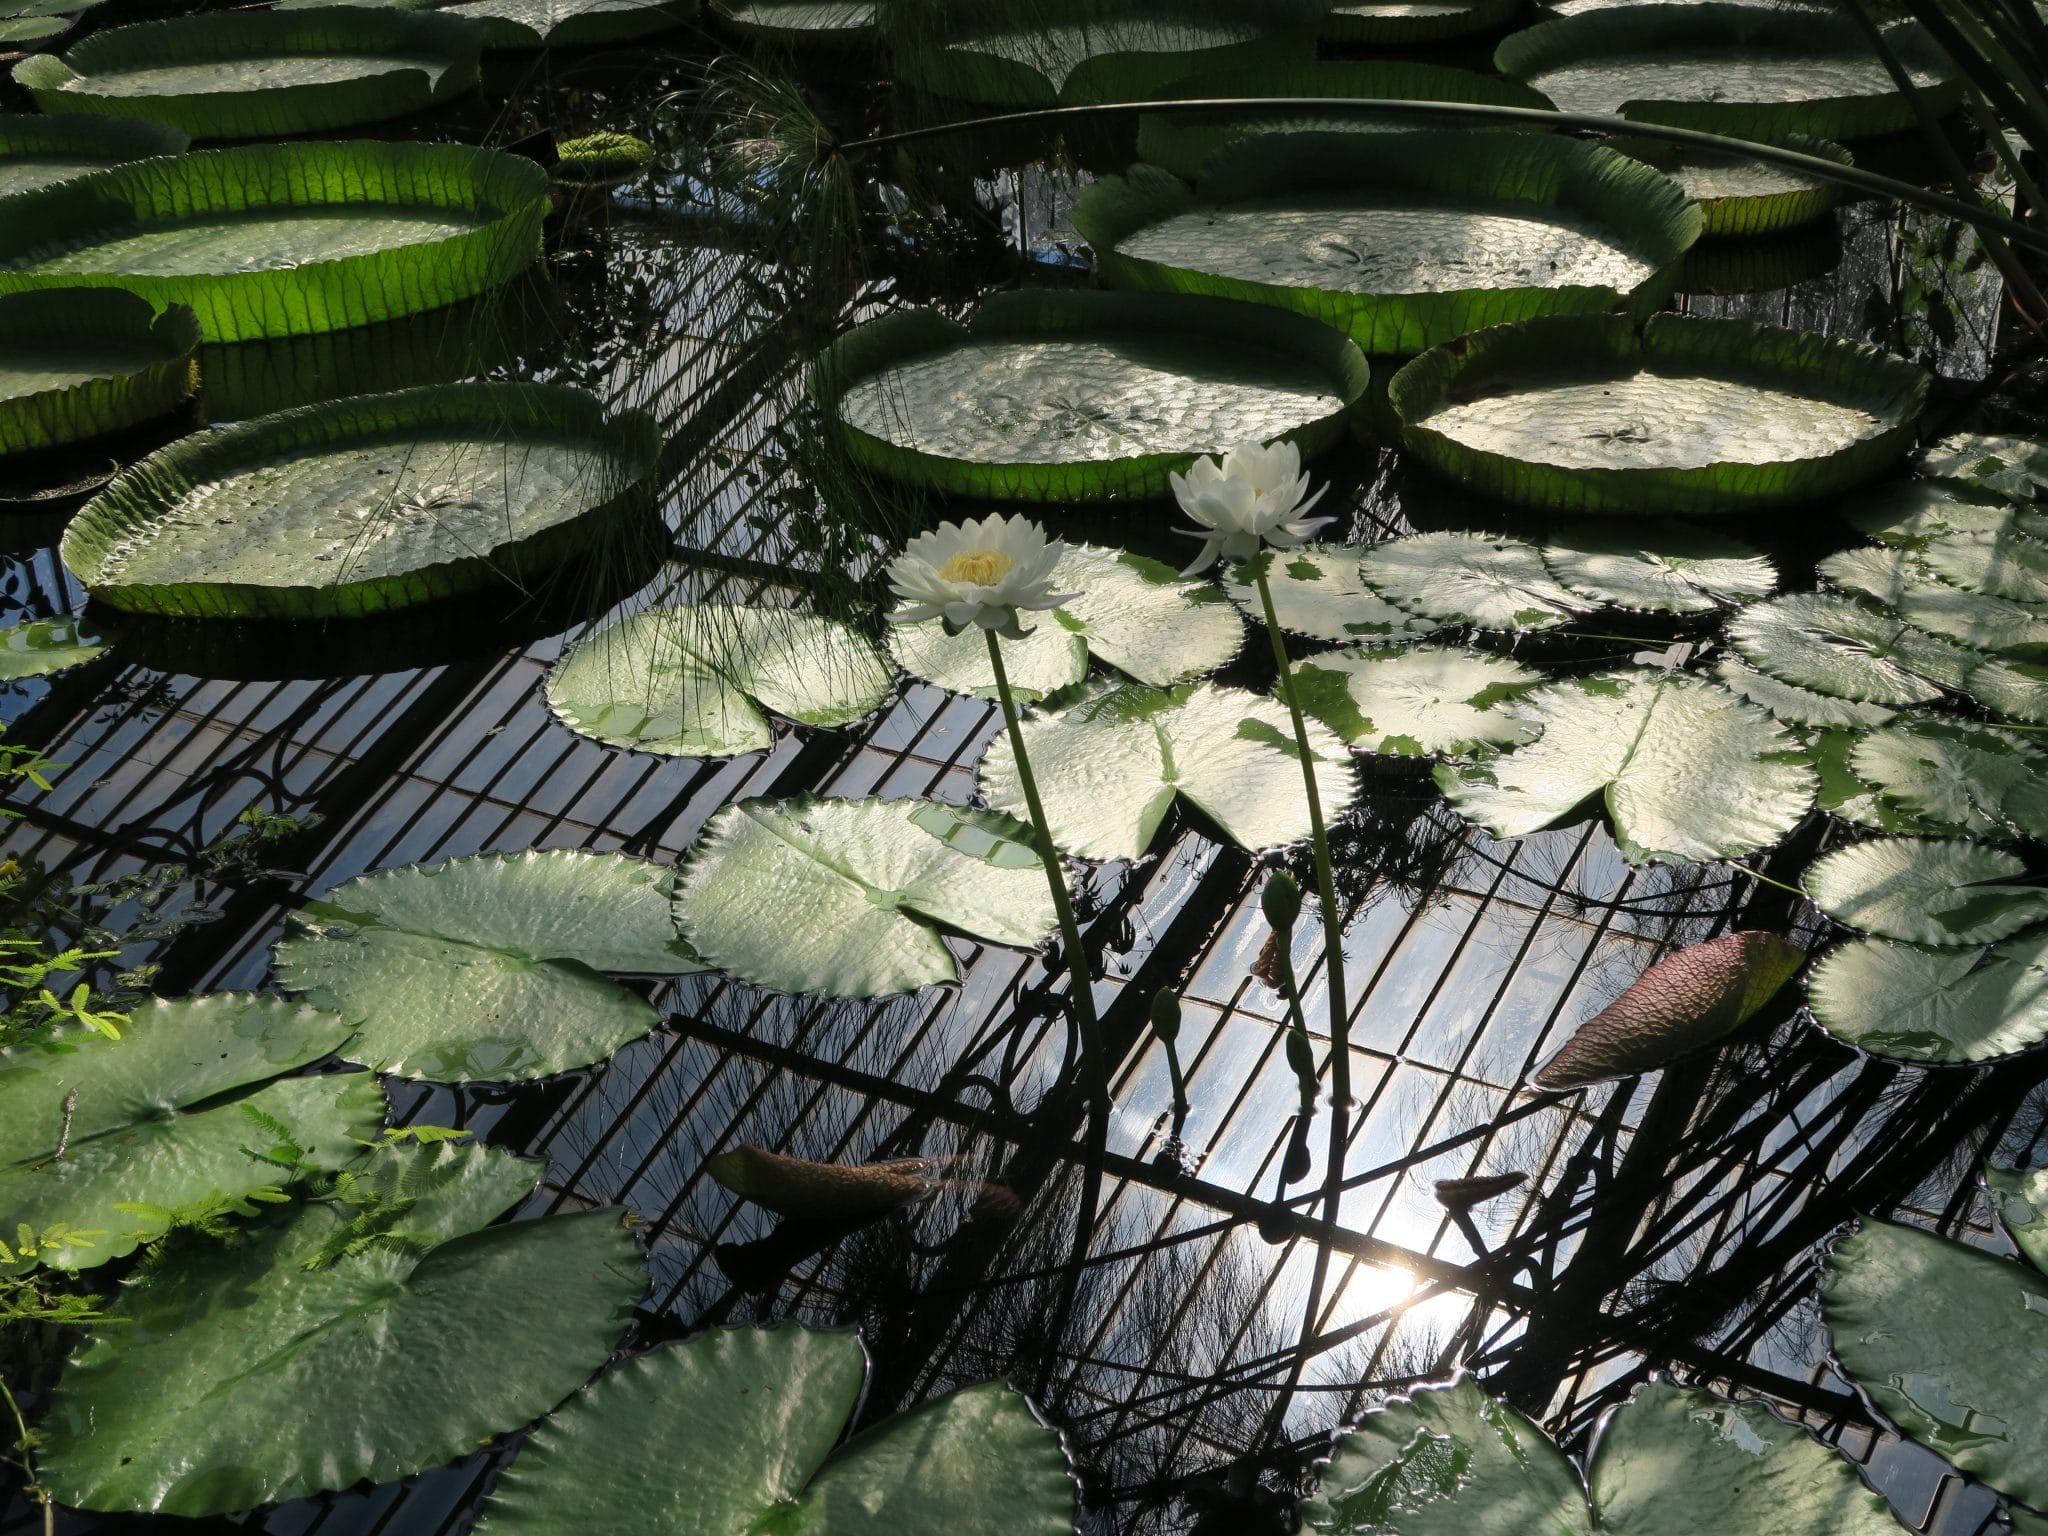 Waterlilies at Kew Gardens